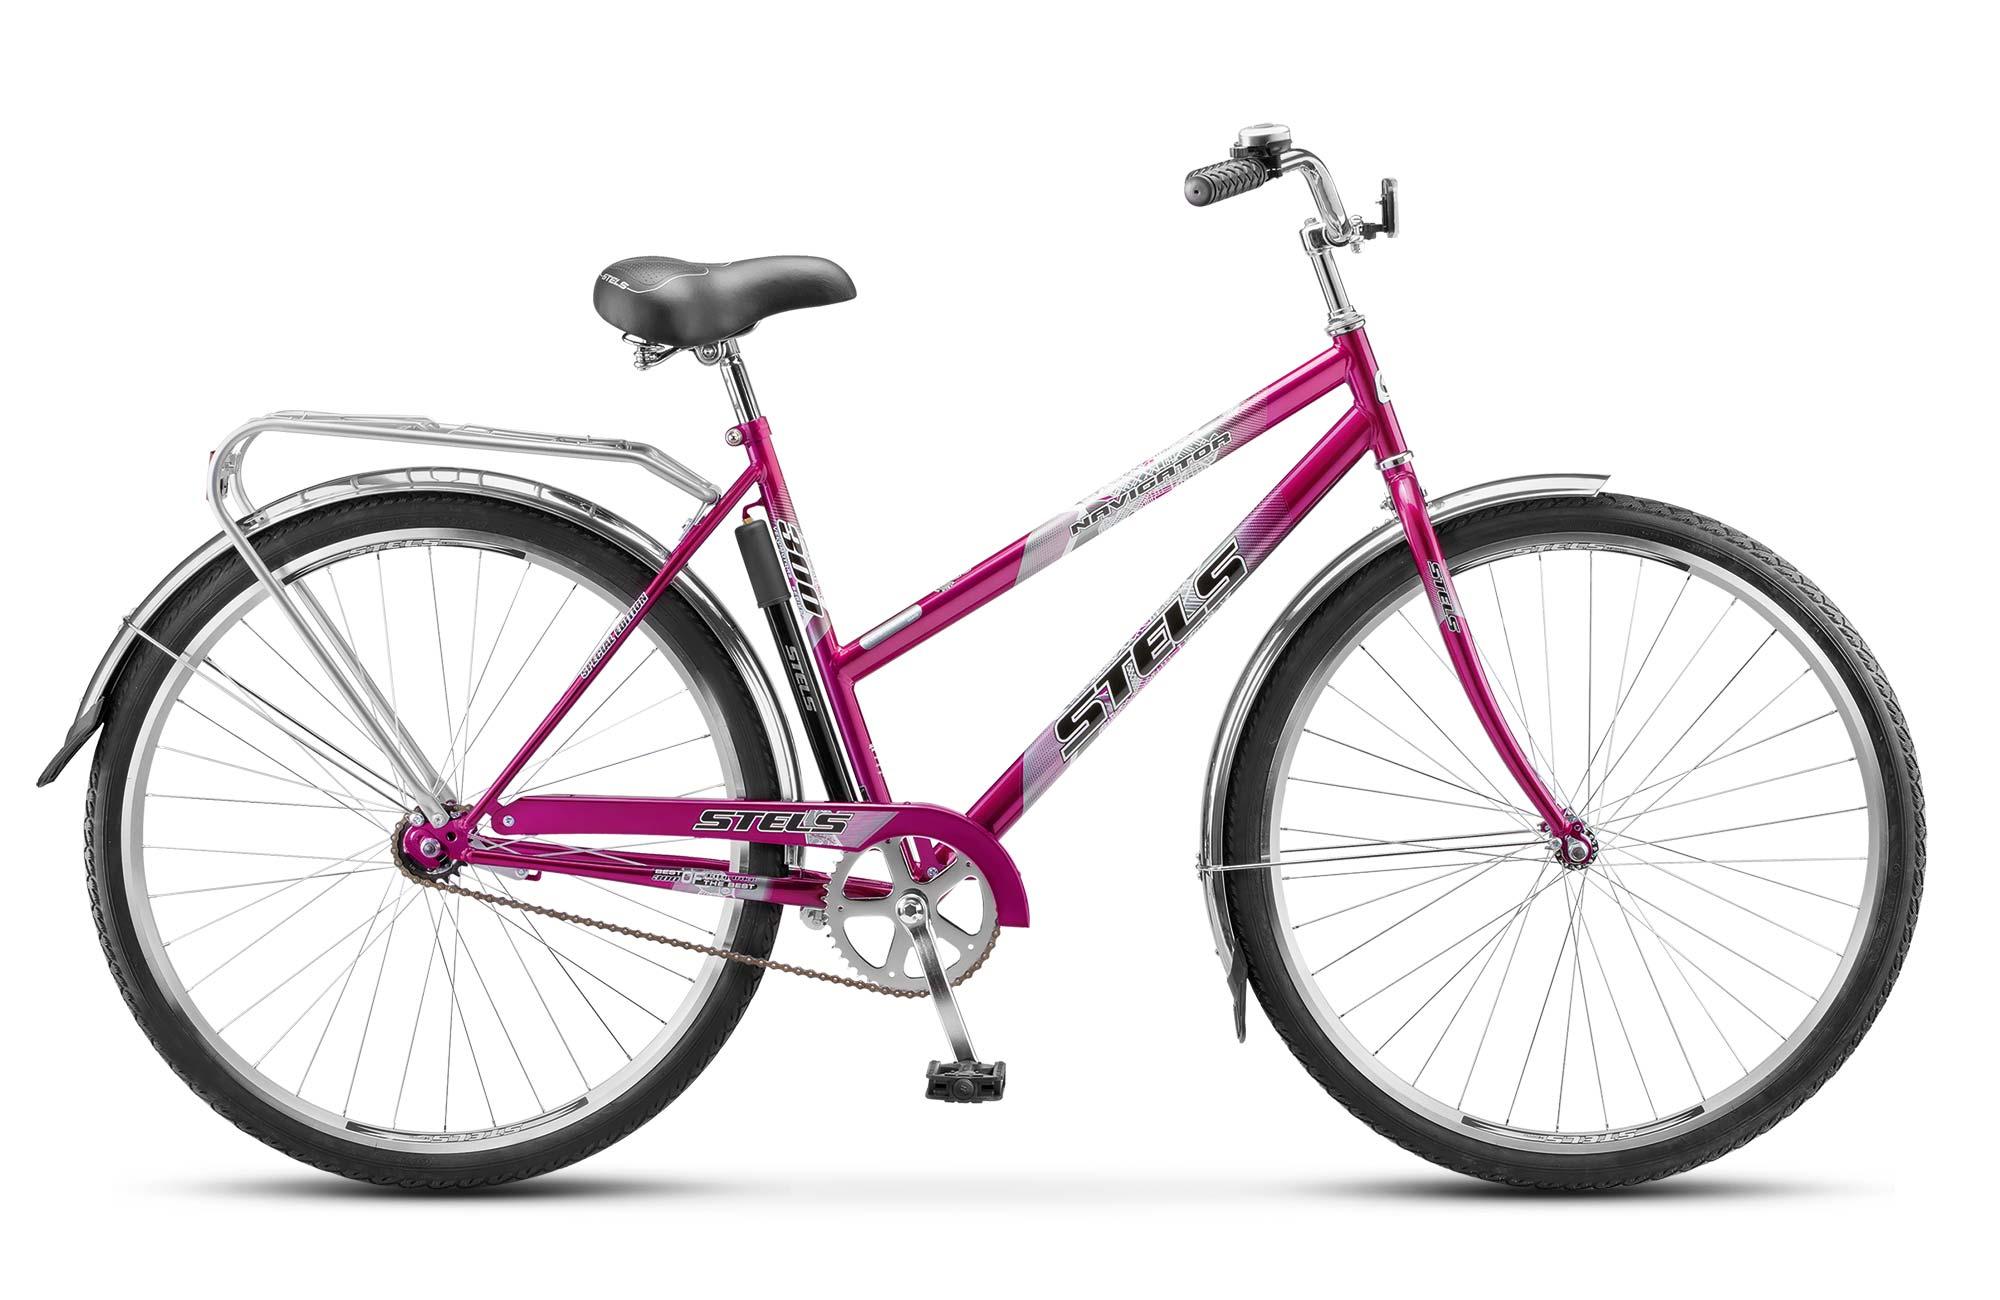 STELS Велосипед Stels Navigator 300 Lady 28 (2017) красный 20 велосипед stels navigator 310 lady 28 2017